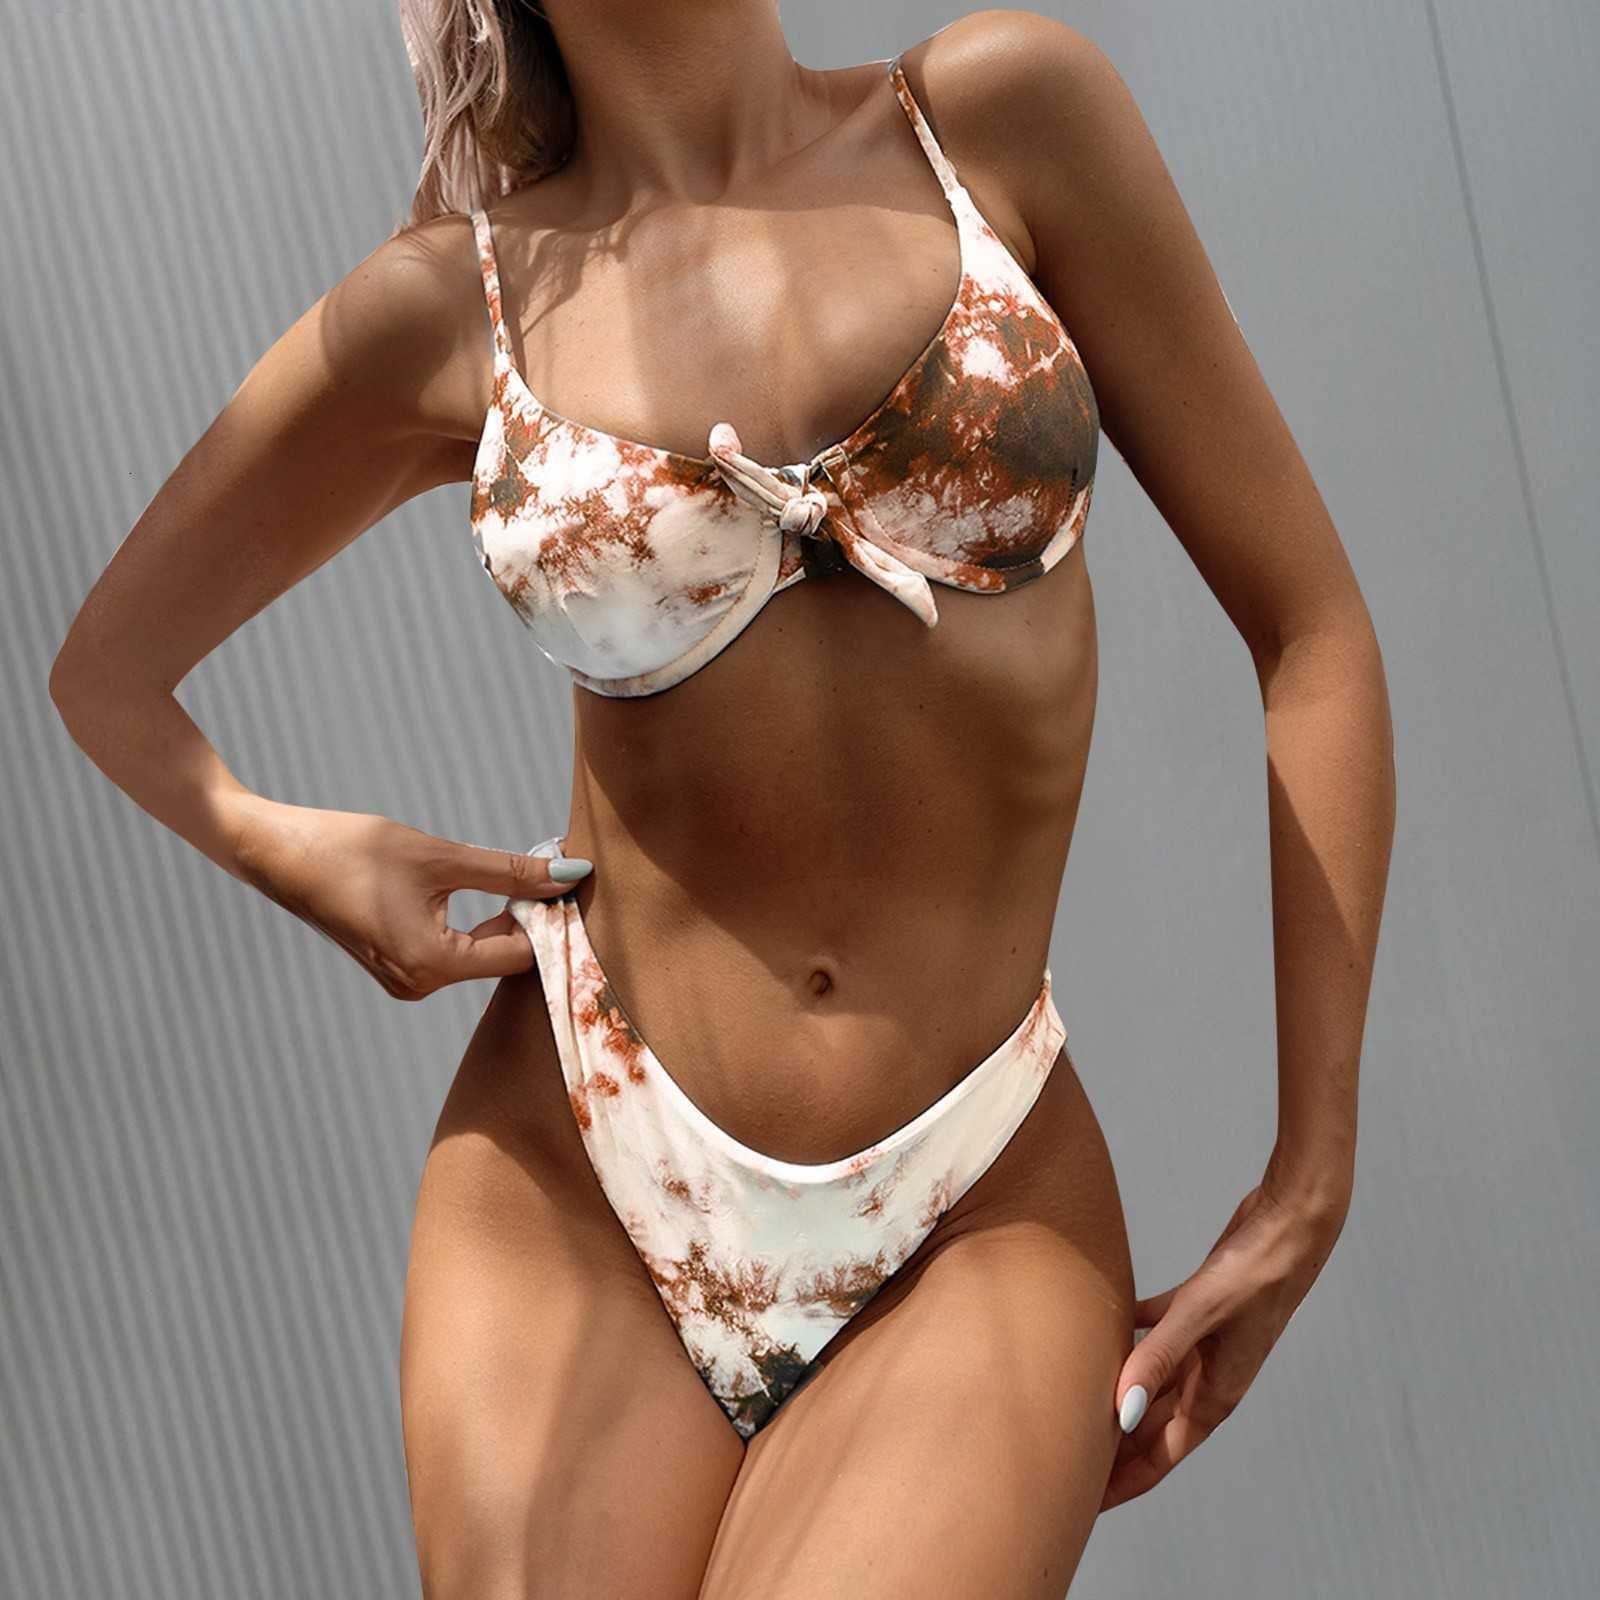 40 Vintage Mid-Taille Tankini Femme Split Baignade Suit Sexy Teinture Tye Convergence Bikini Bowknot Maillot de bain